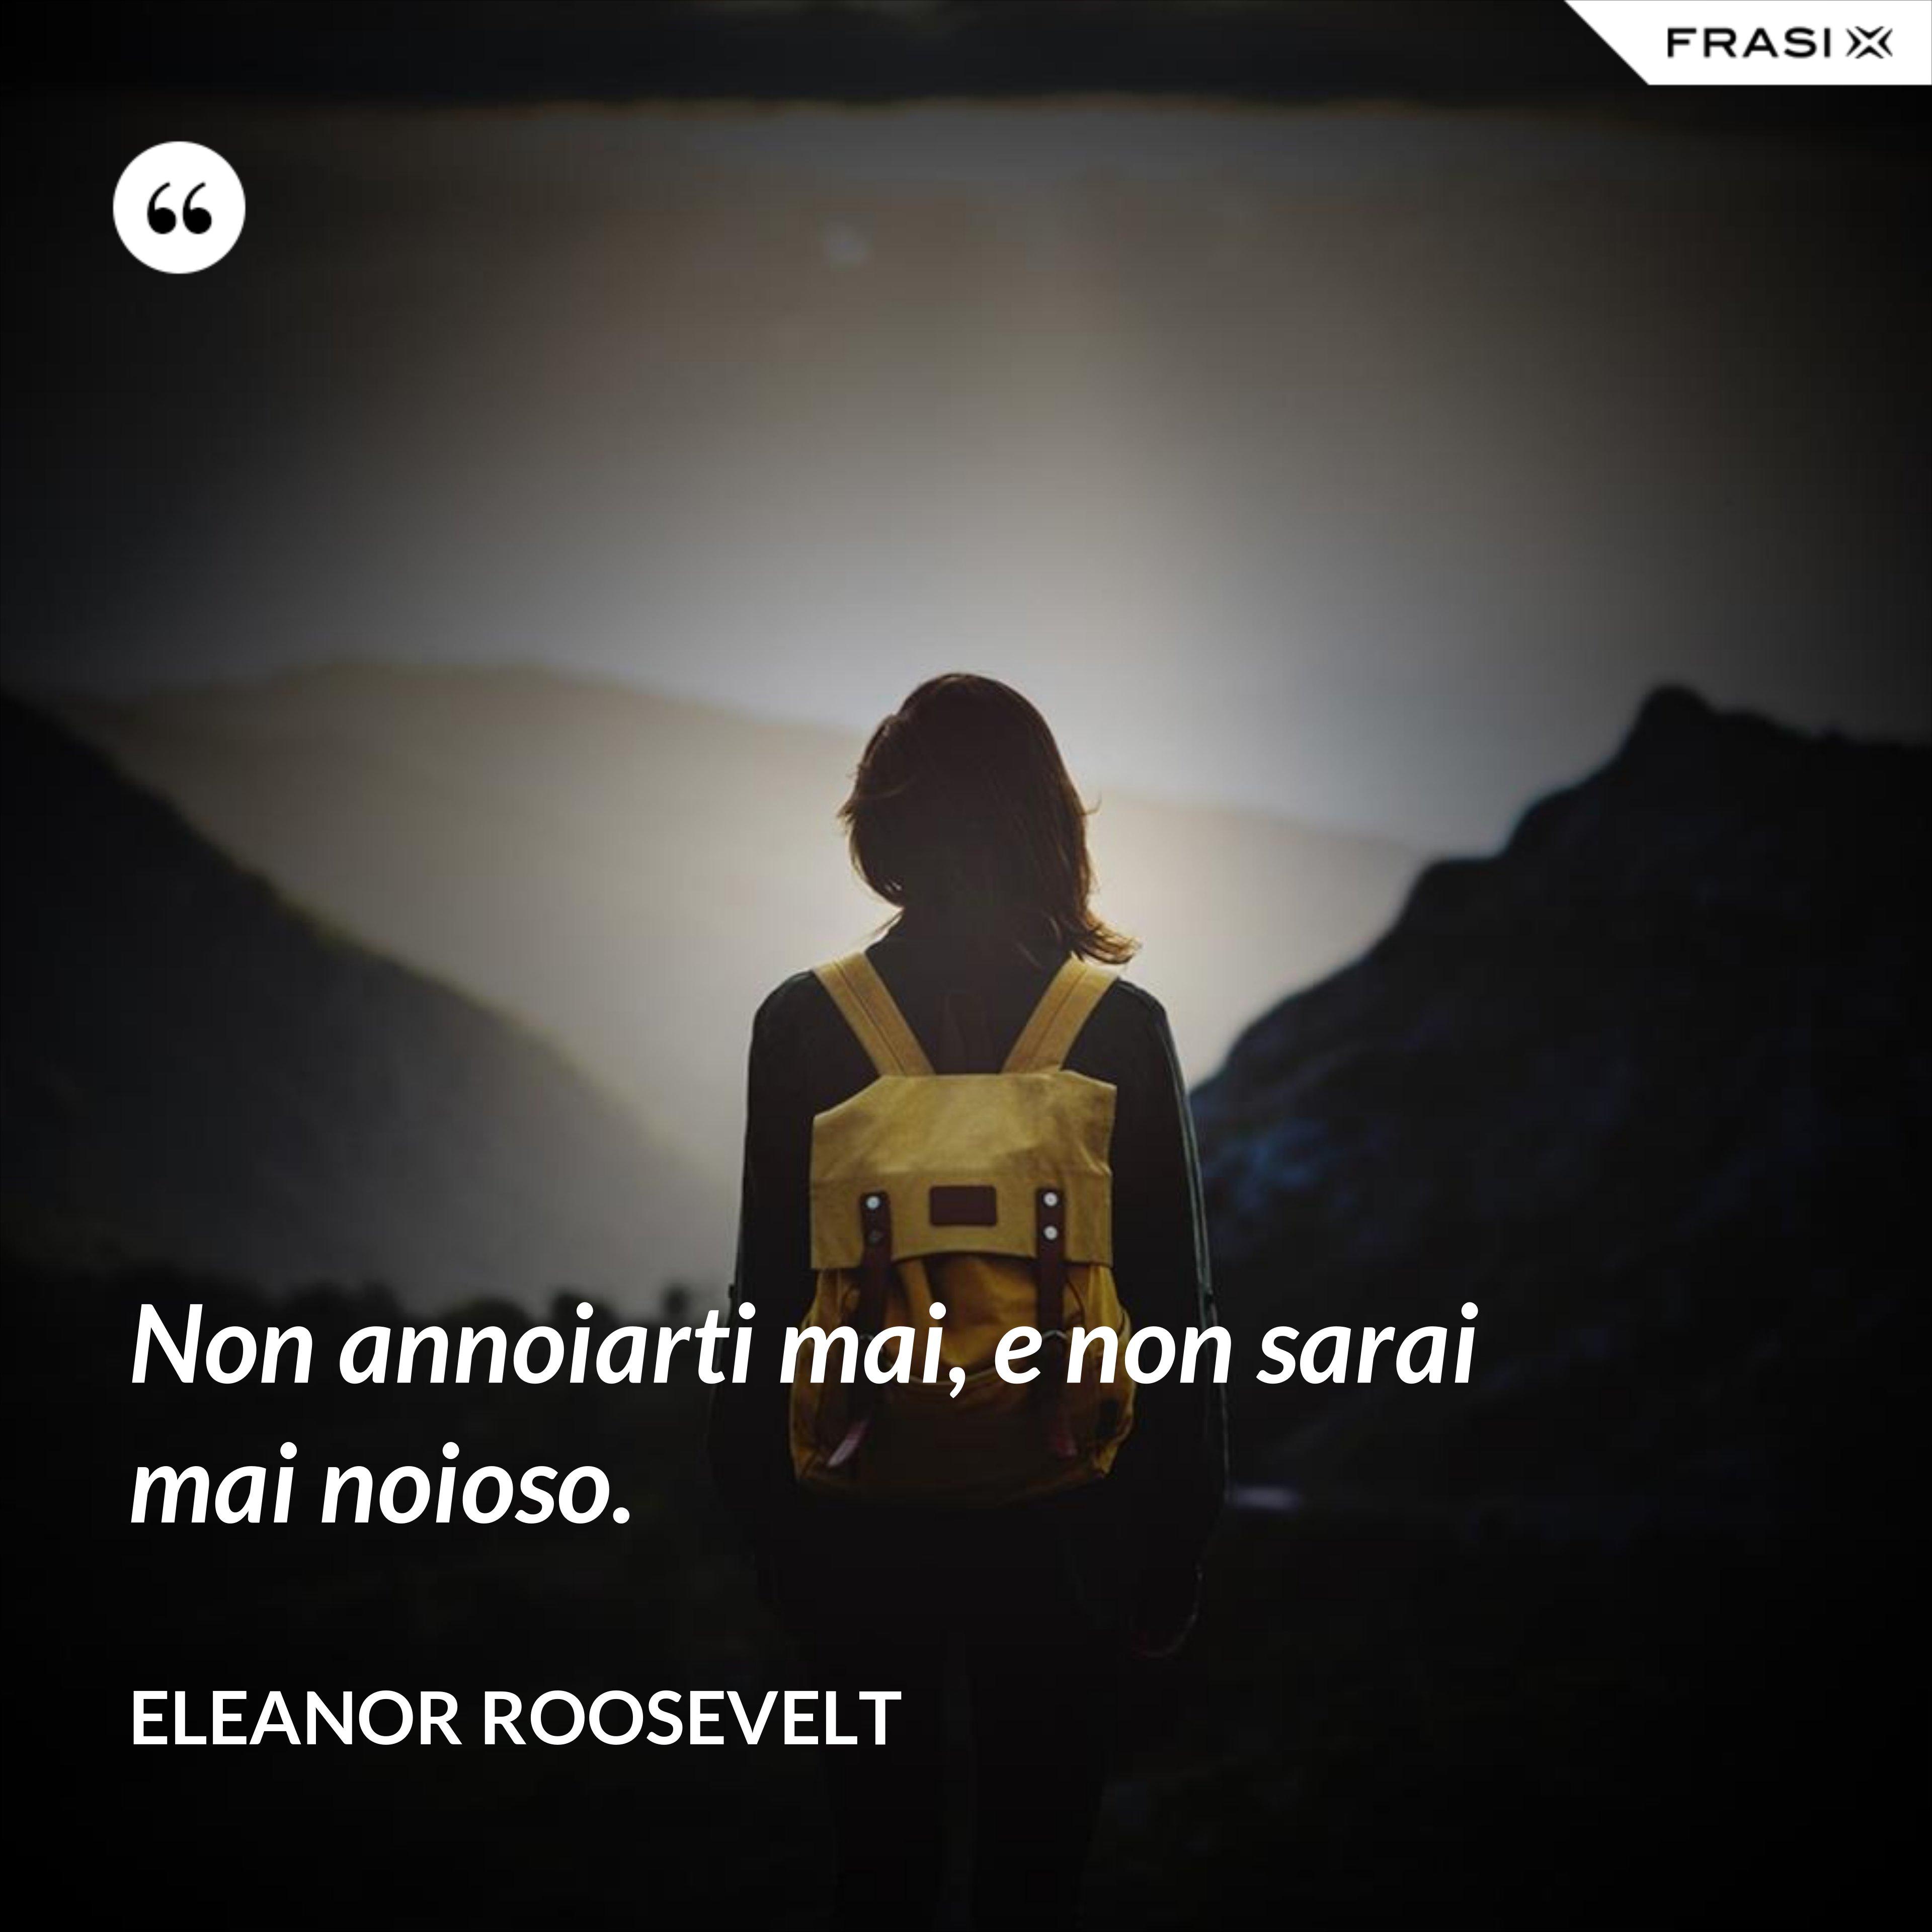 Non annoiarti mai, e non sarai mai noioso. - Eleanor Roosevelt